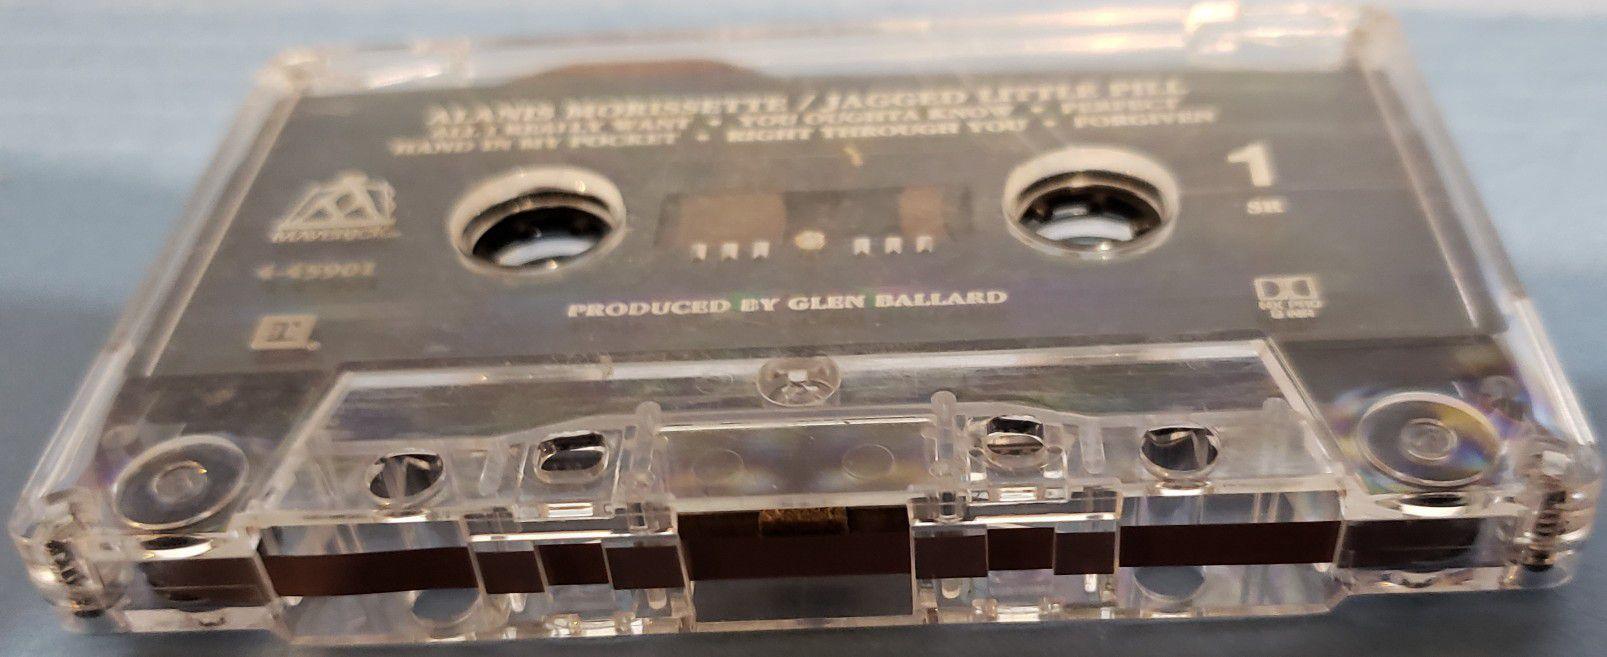 VINTAGE COLLECTABLE MUSIC CASSETTE TAPE ALANIS MORISSETTE JAGGED LITTLE PILL